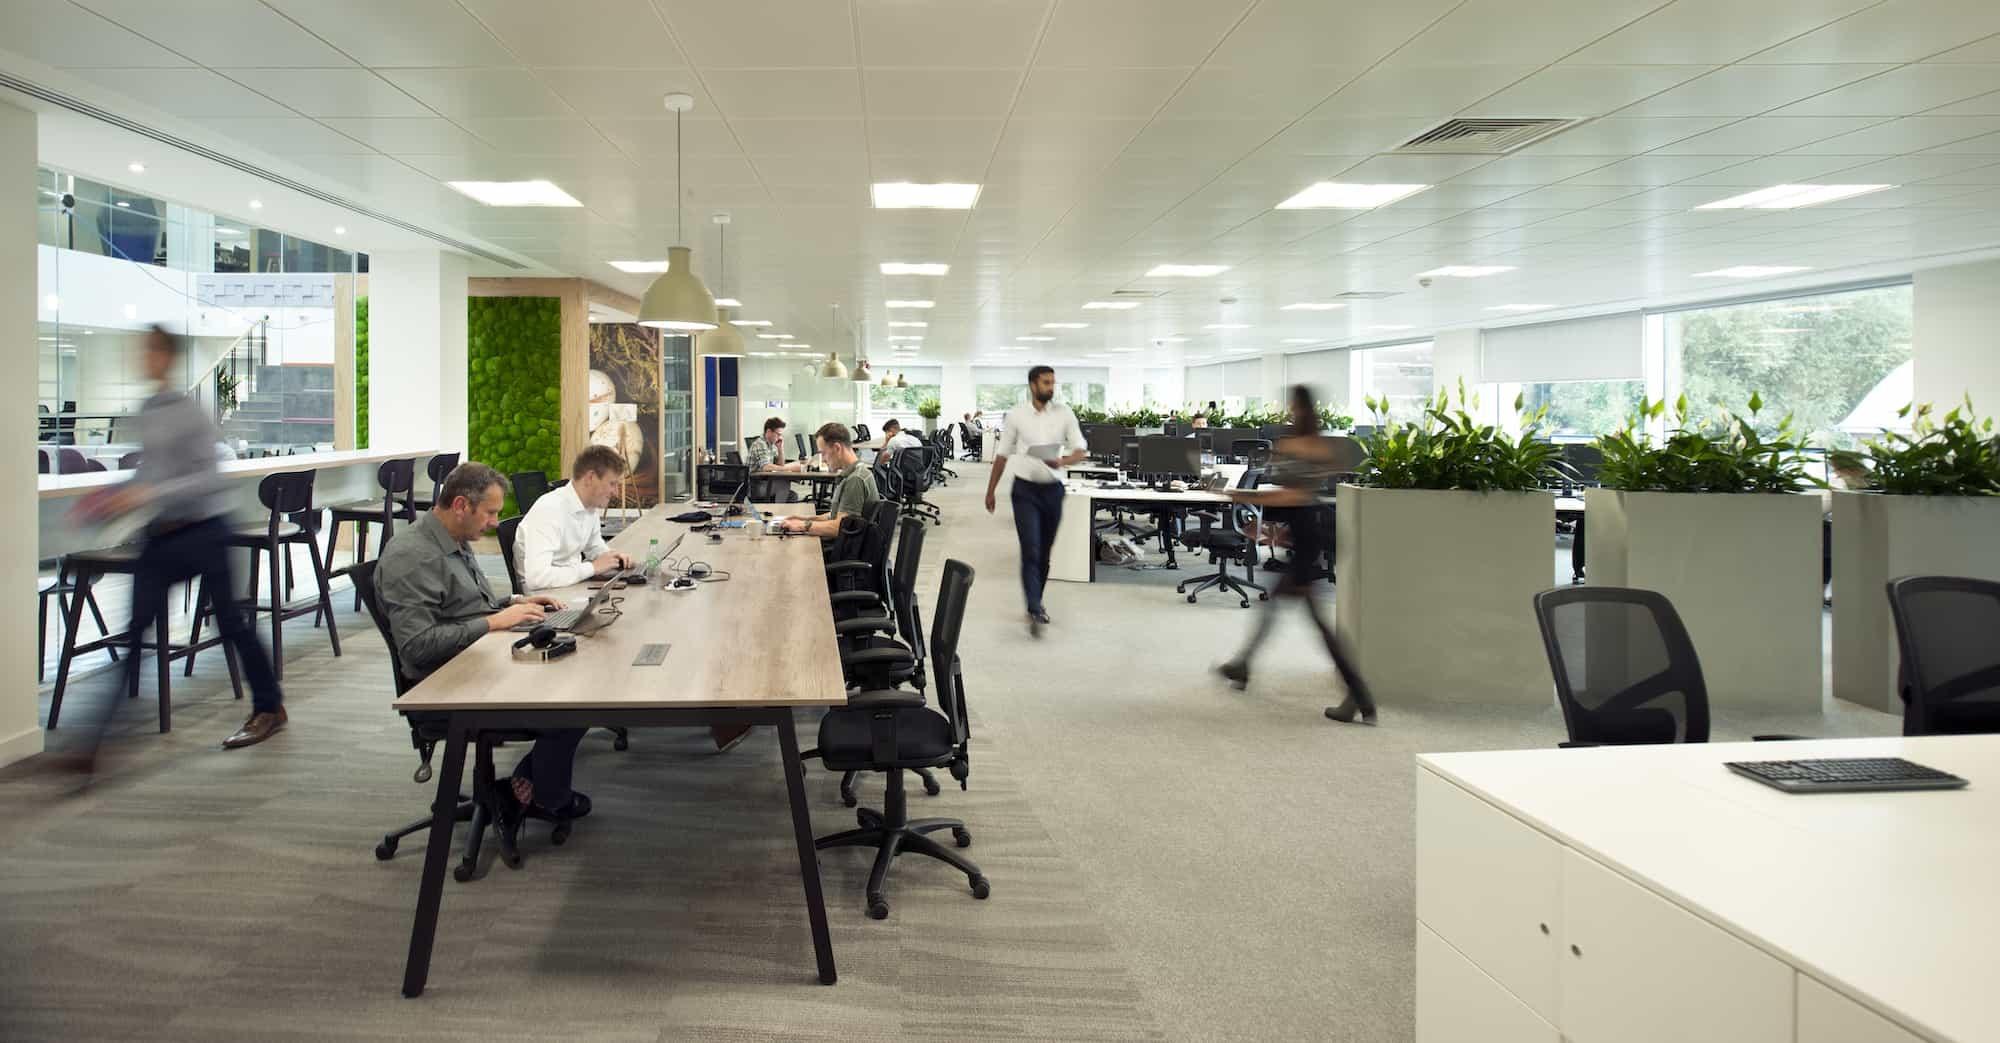 Open plan biophilic office design